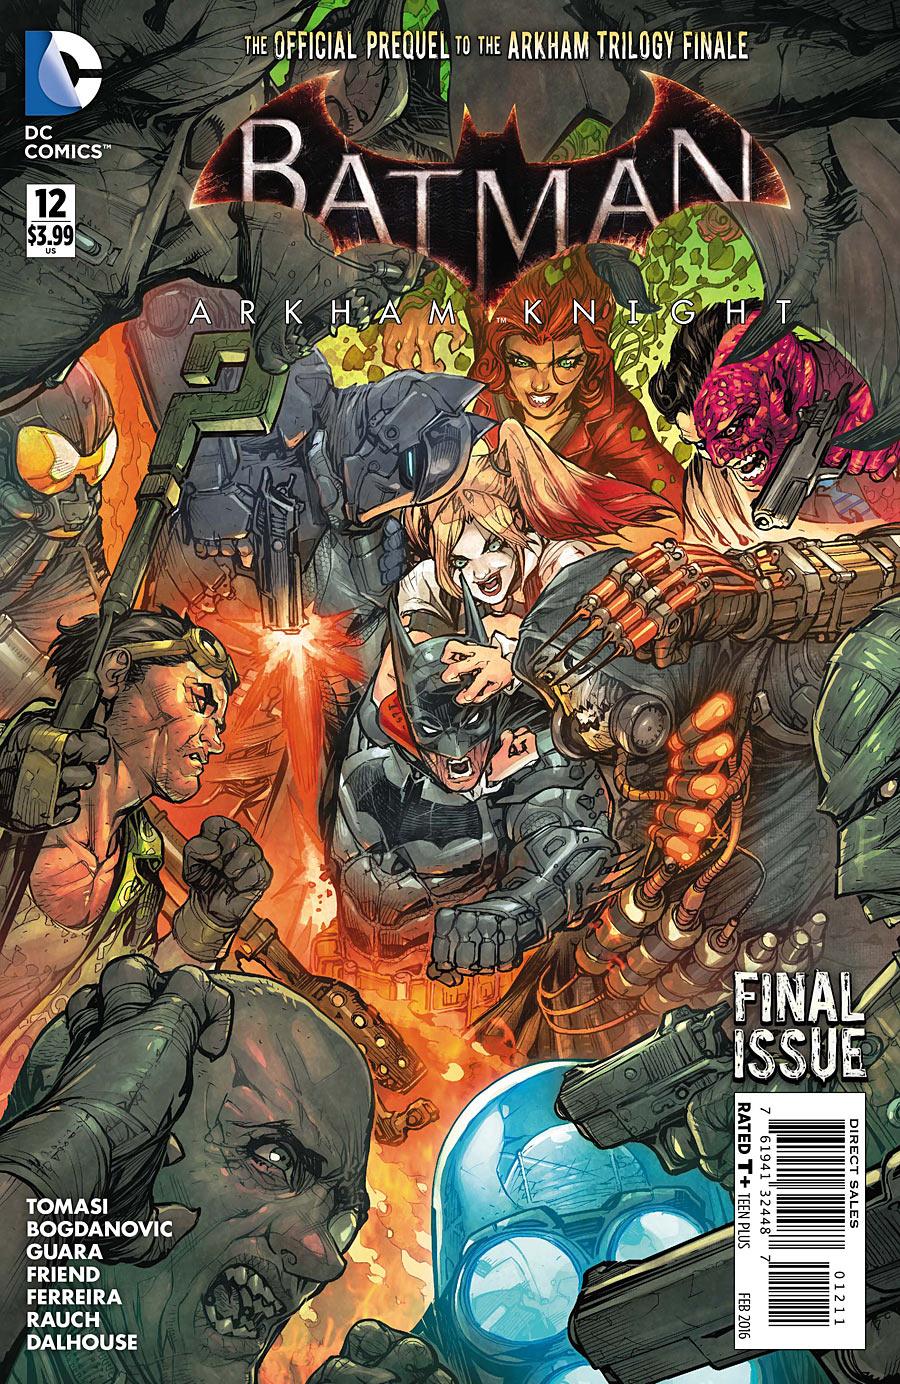 Batman: Arkham Knight #12